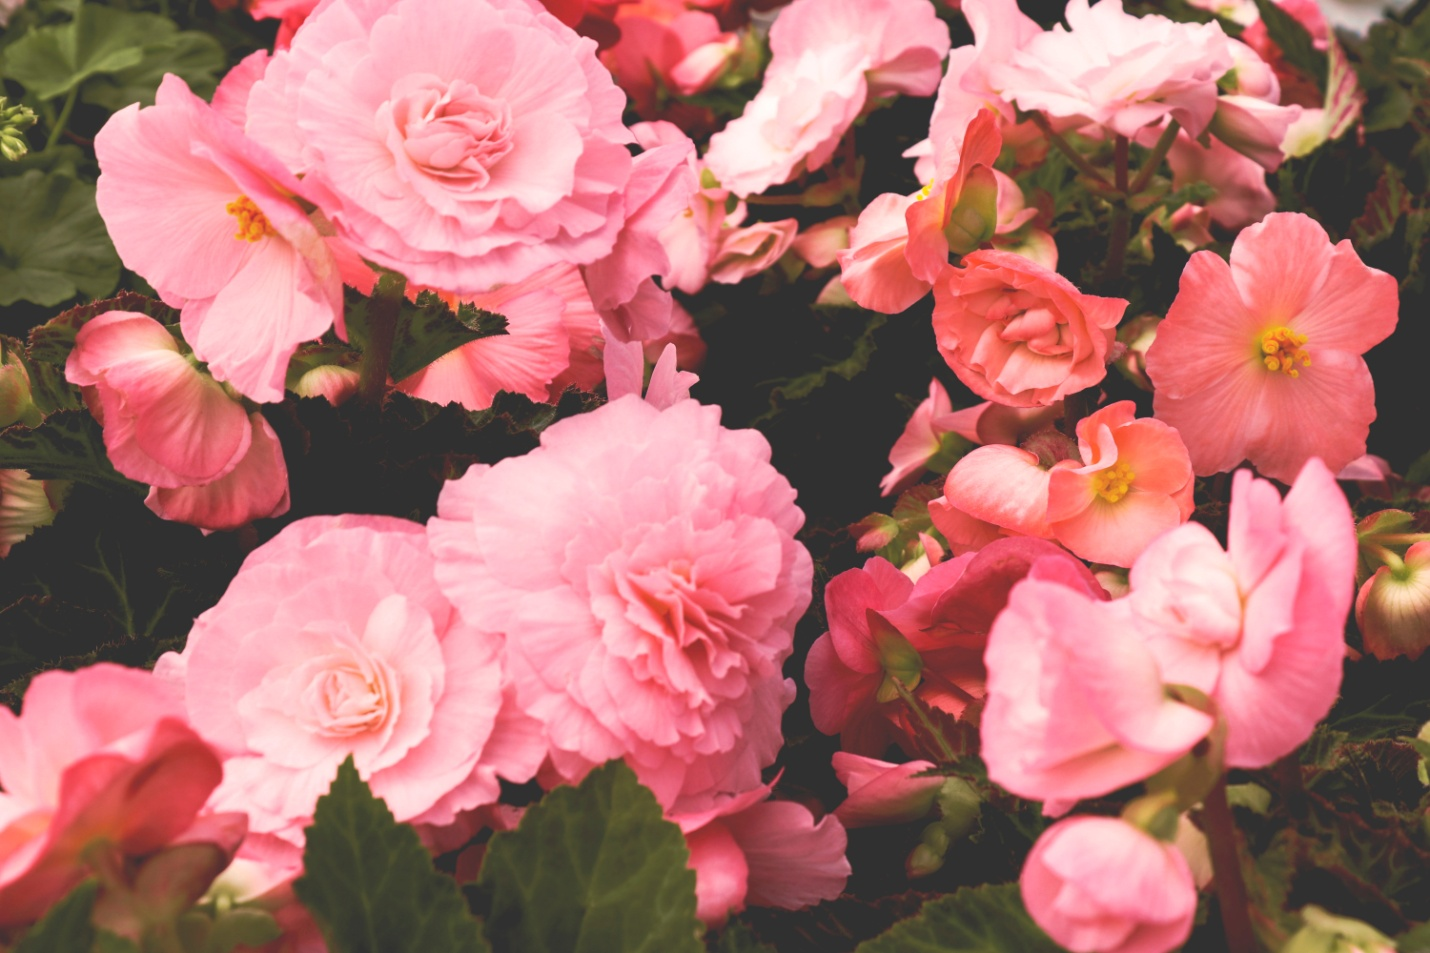 Petunia flower for your garden